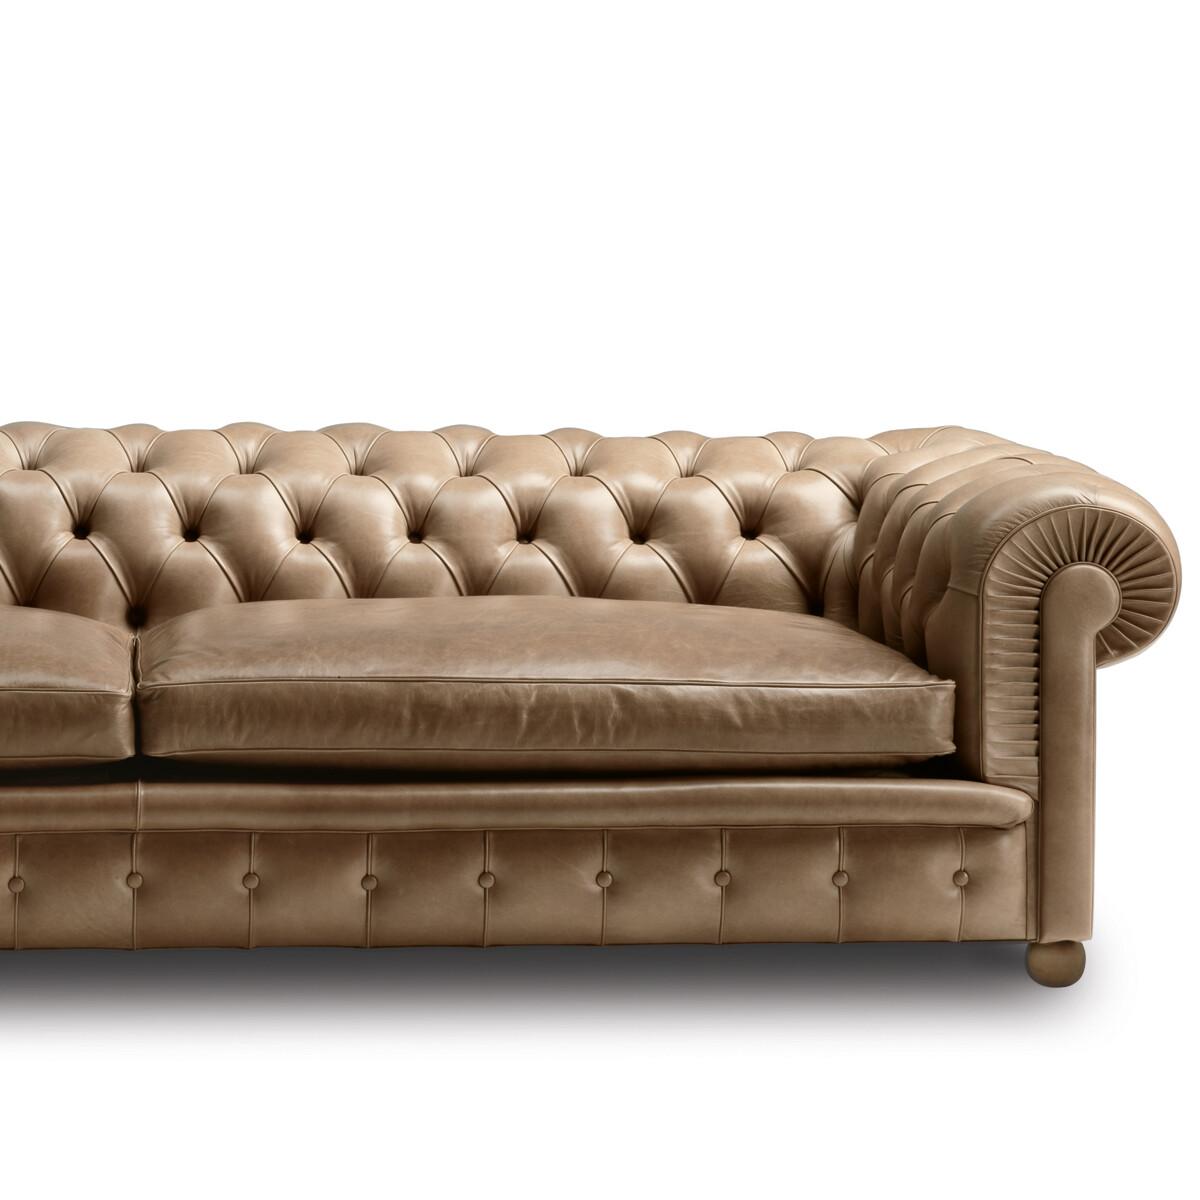 Poltrona frau chester one sofa casa de for Chester poltrona frau